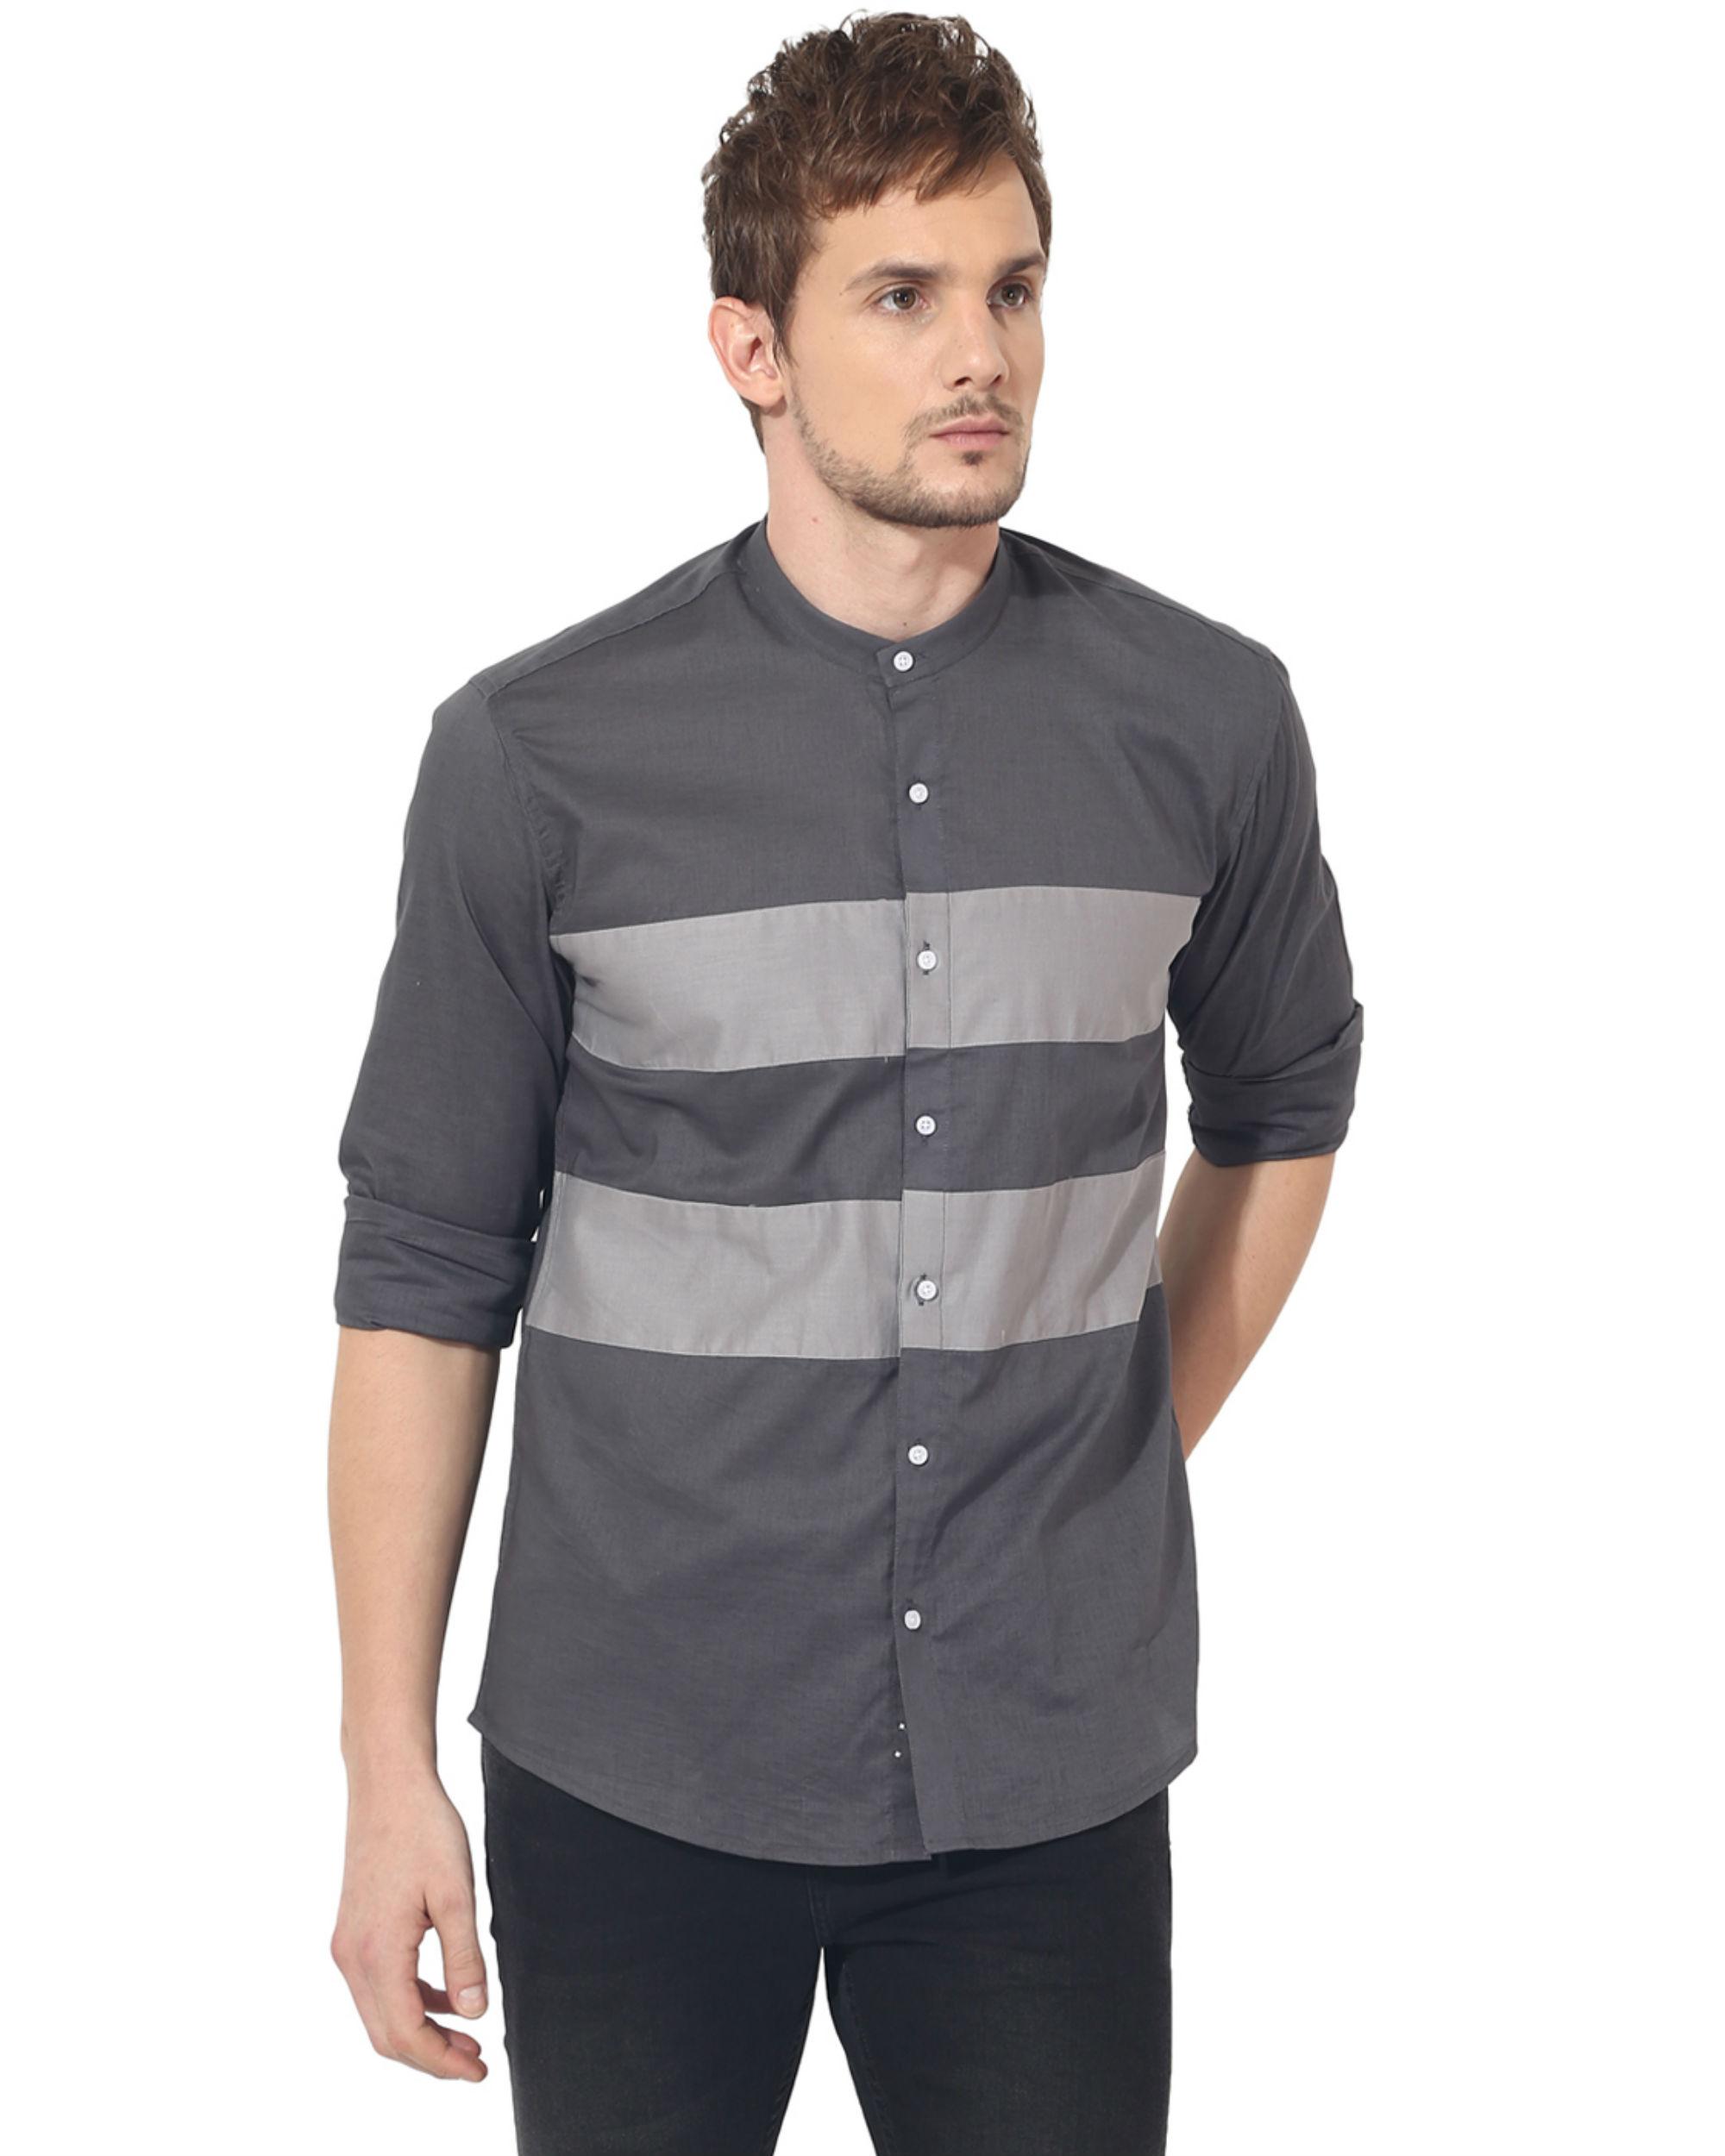 Grey two stripes panel club wear shirt